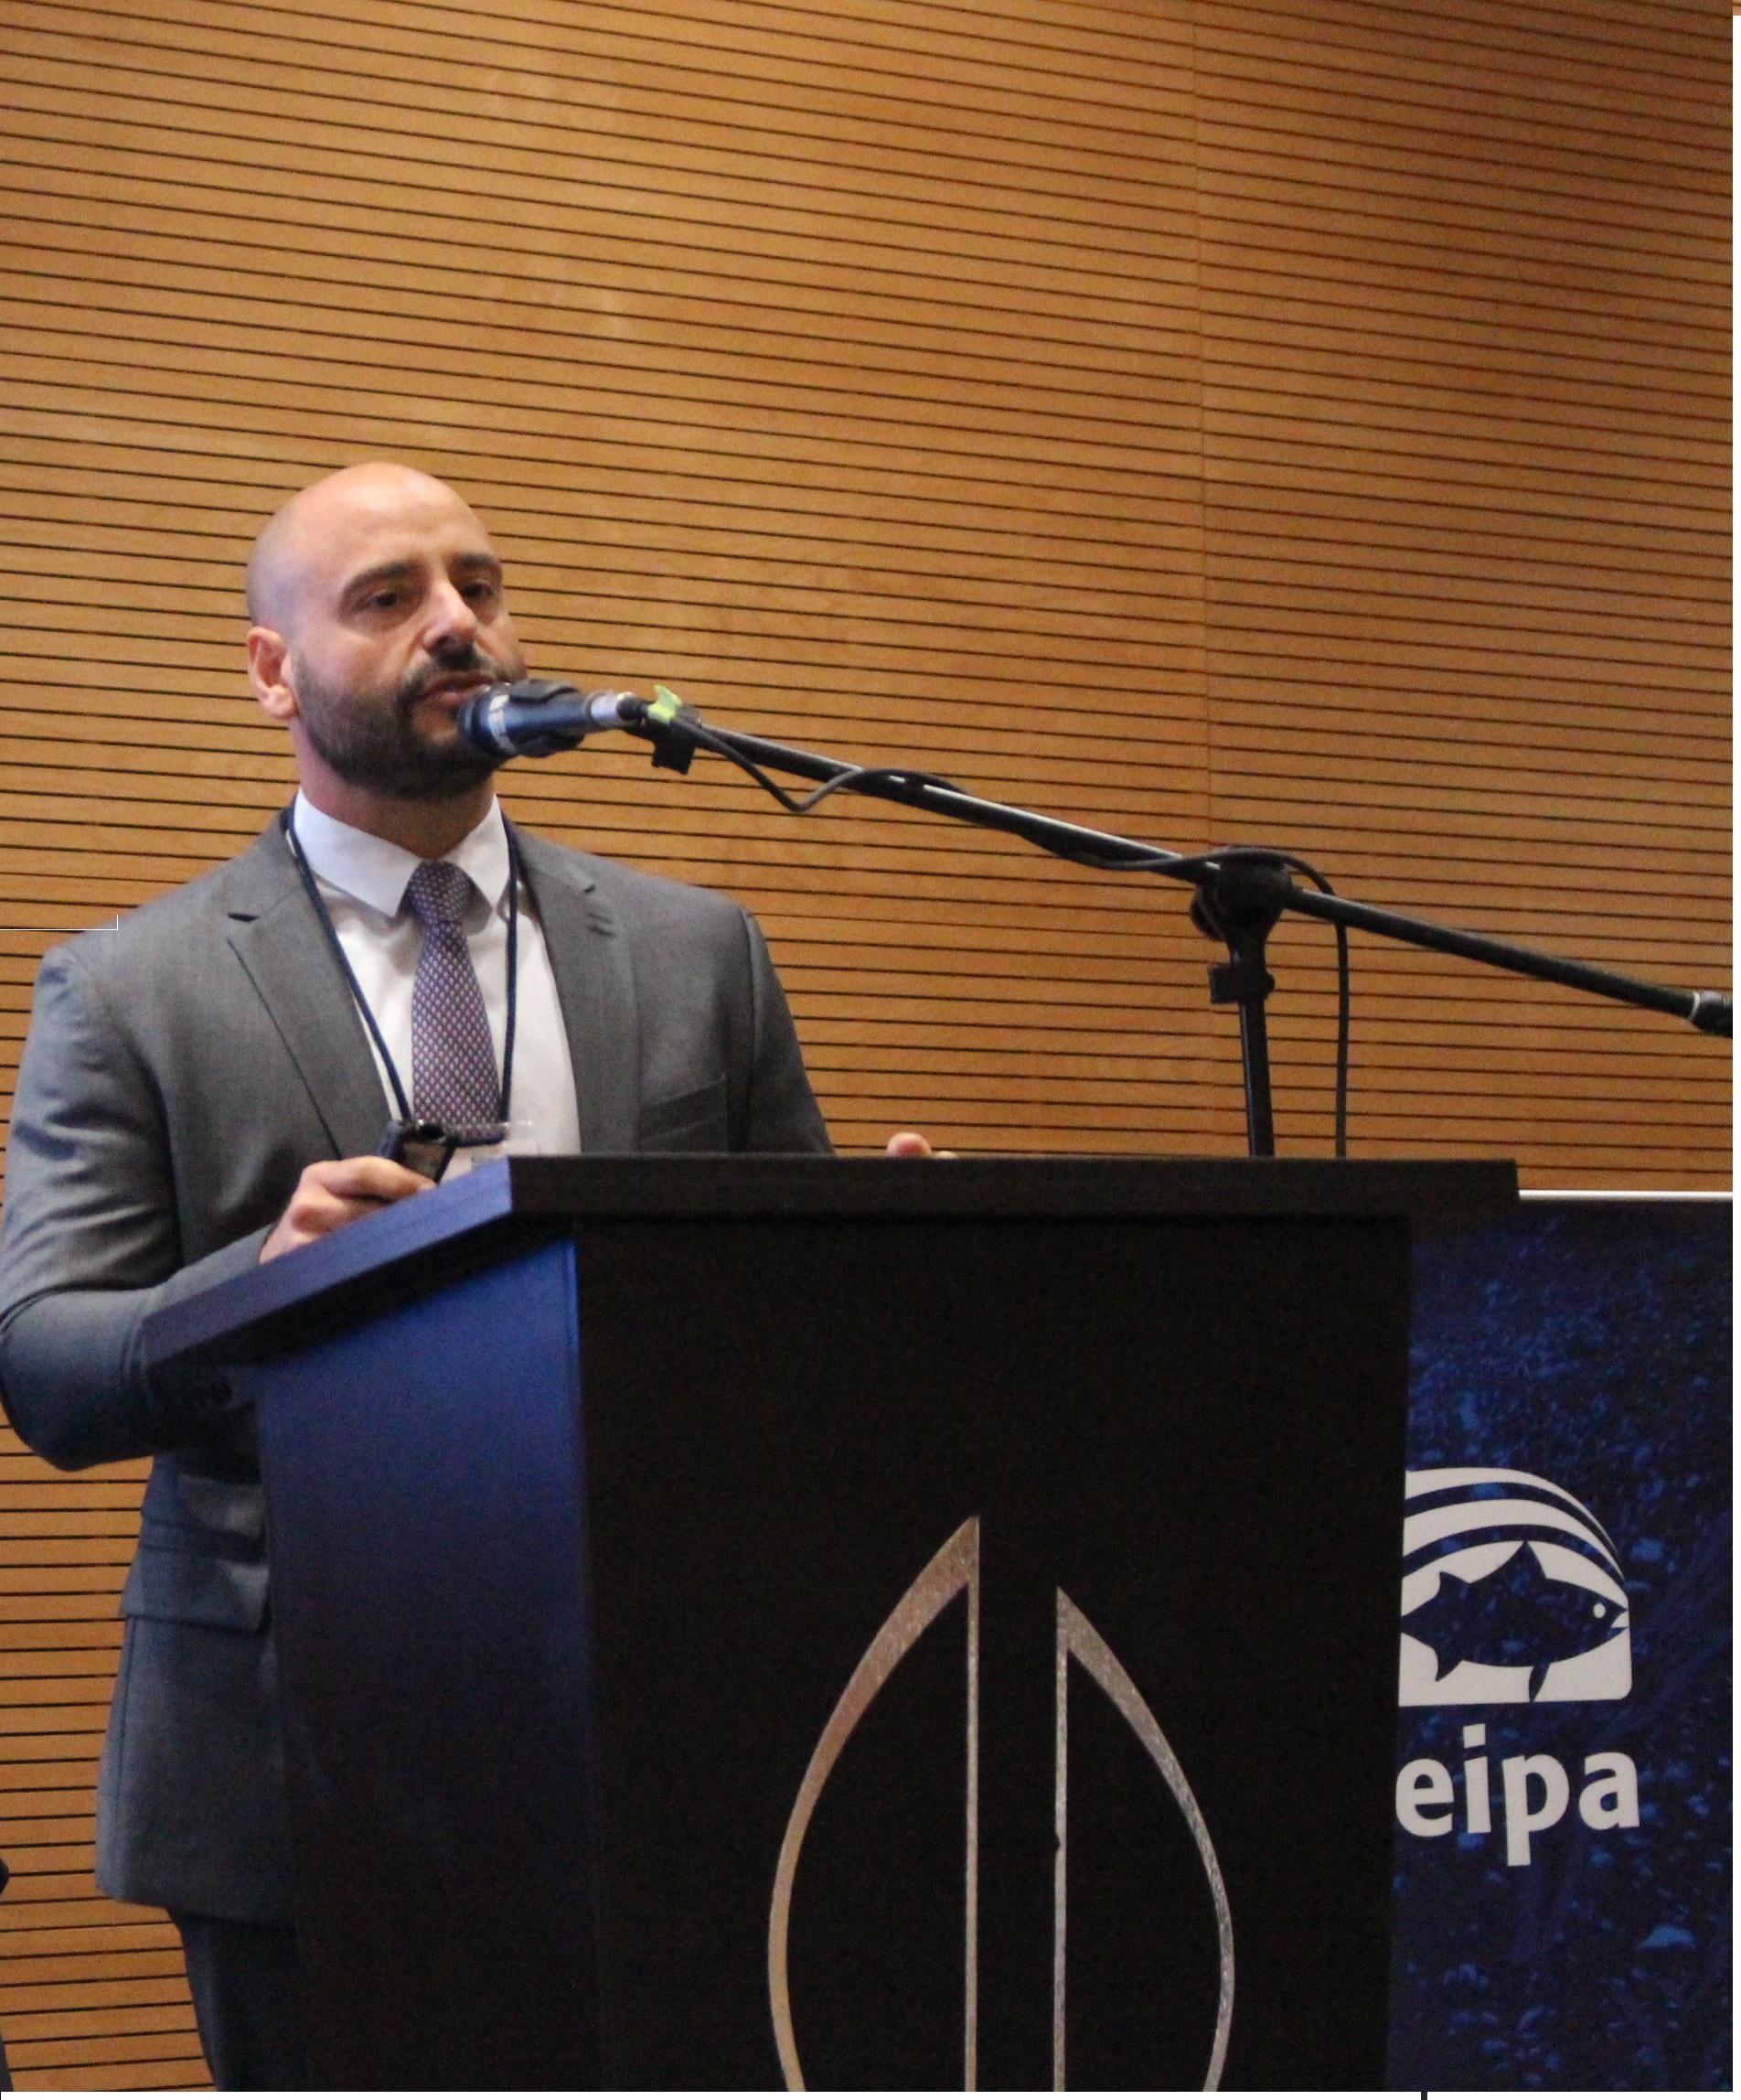 Nicolas L. Gutierrez